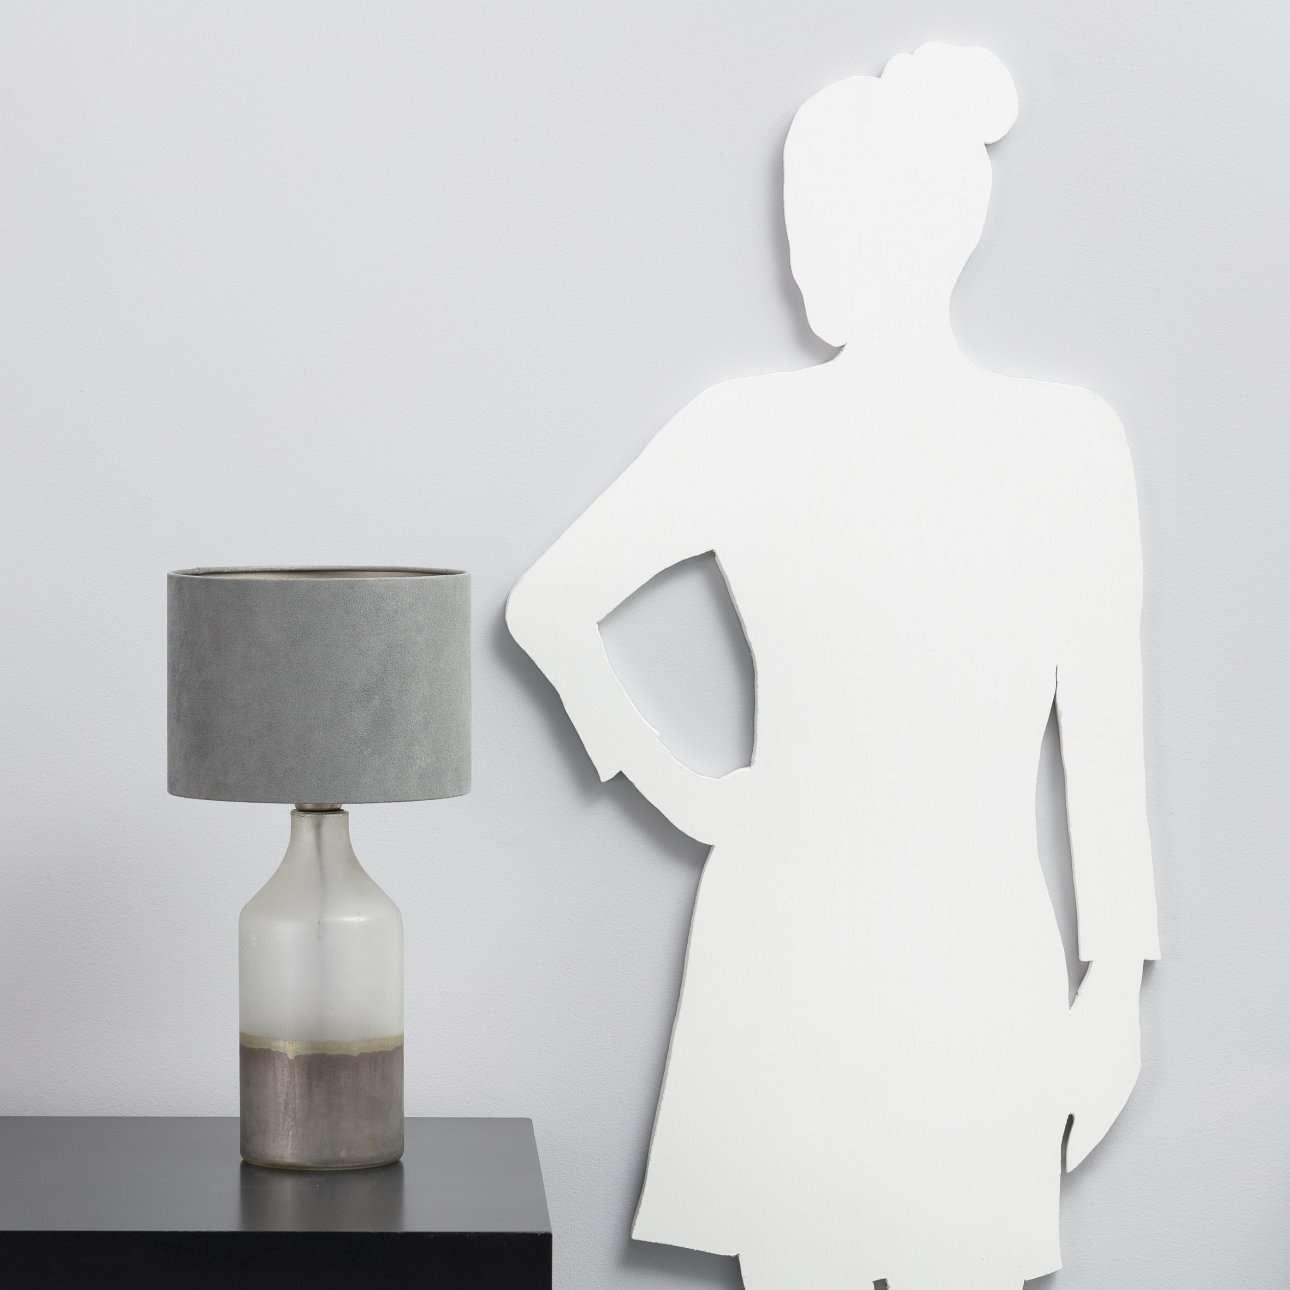 Lampa stojąca Ikura wys. 50cm